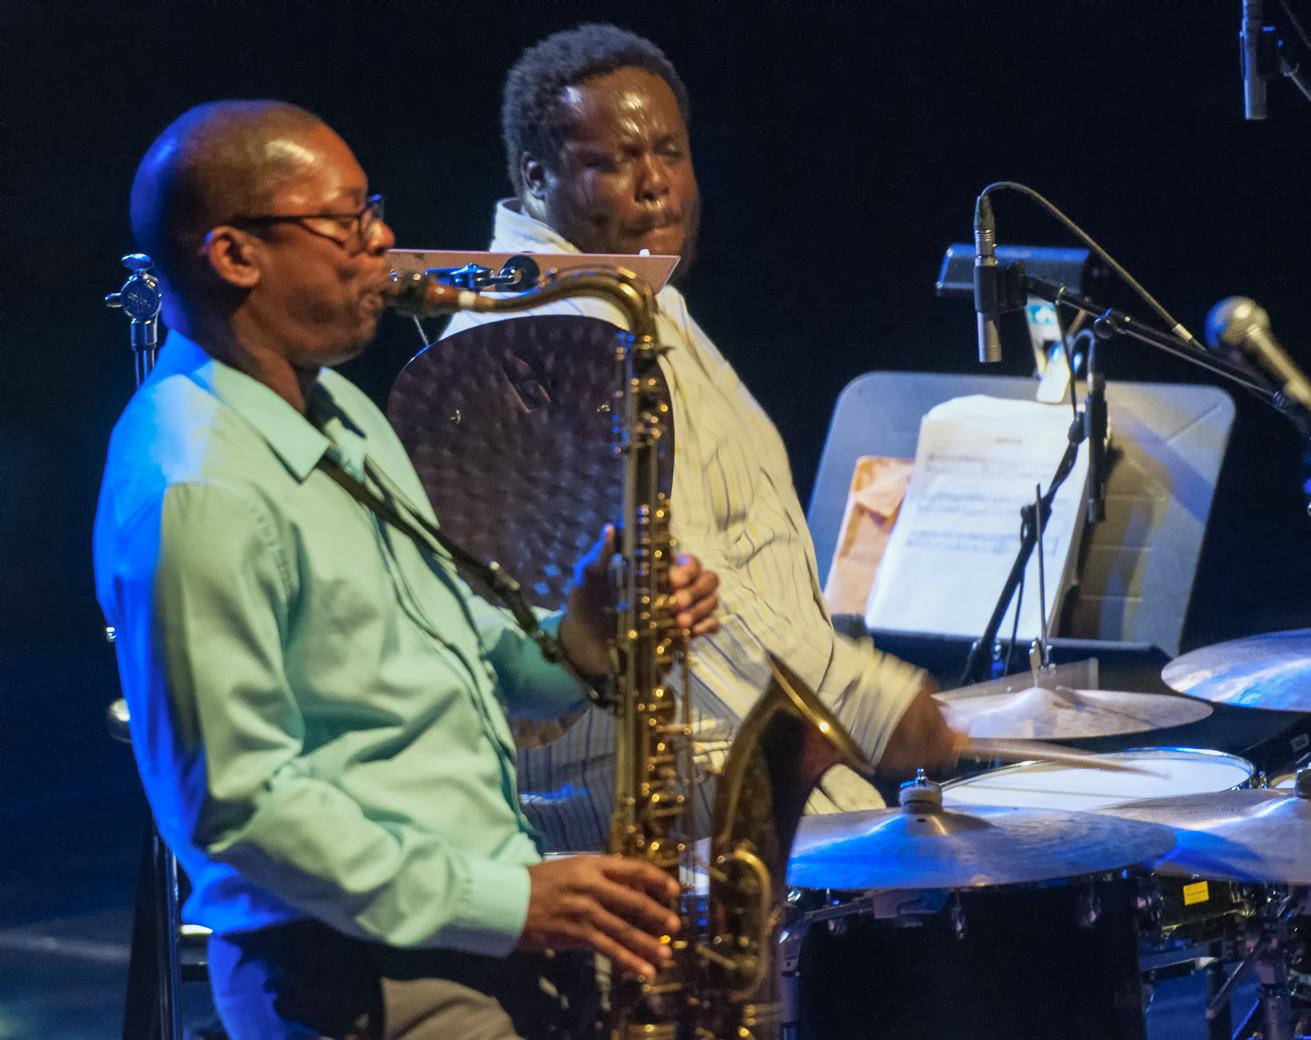 Ravi Coltrane And Johnathan Blake At The Montreal International Jazz Festival 2013